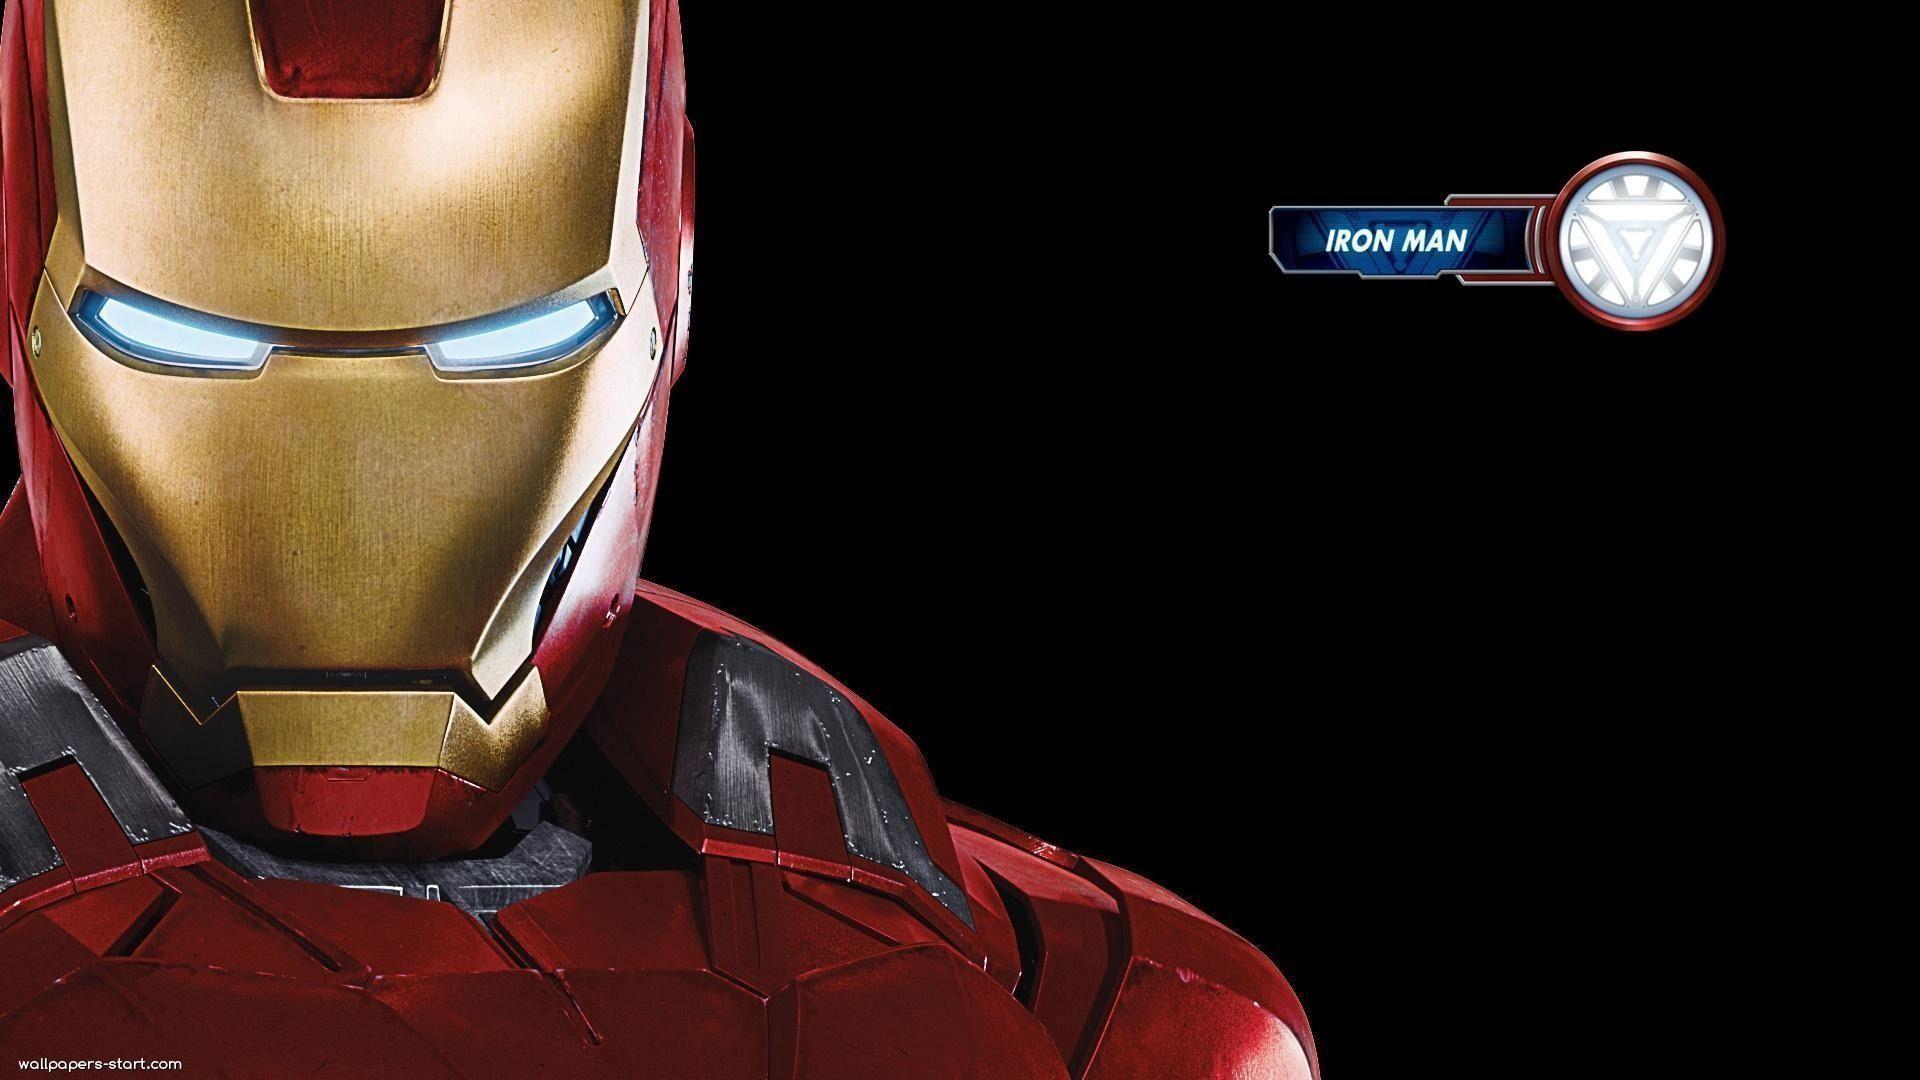 Wallpapers For > Iron Man 3 Wallpaper Hd For Desktop